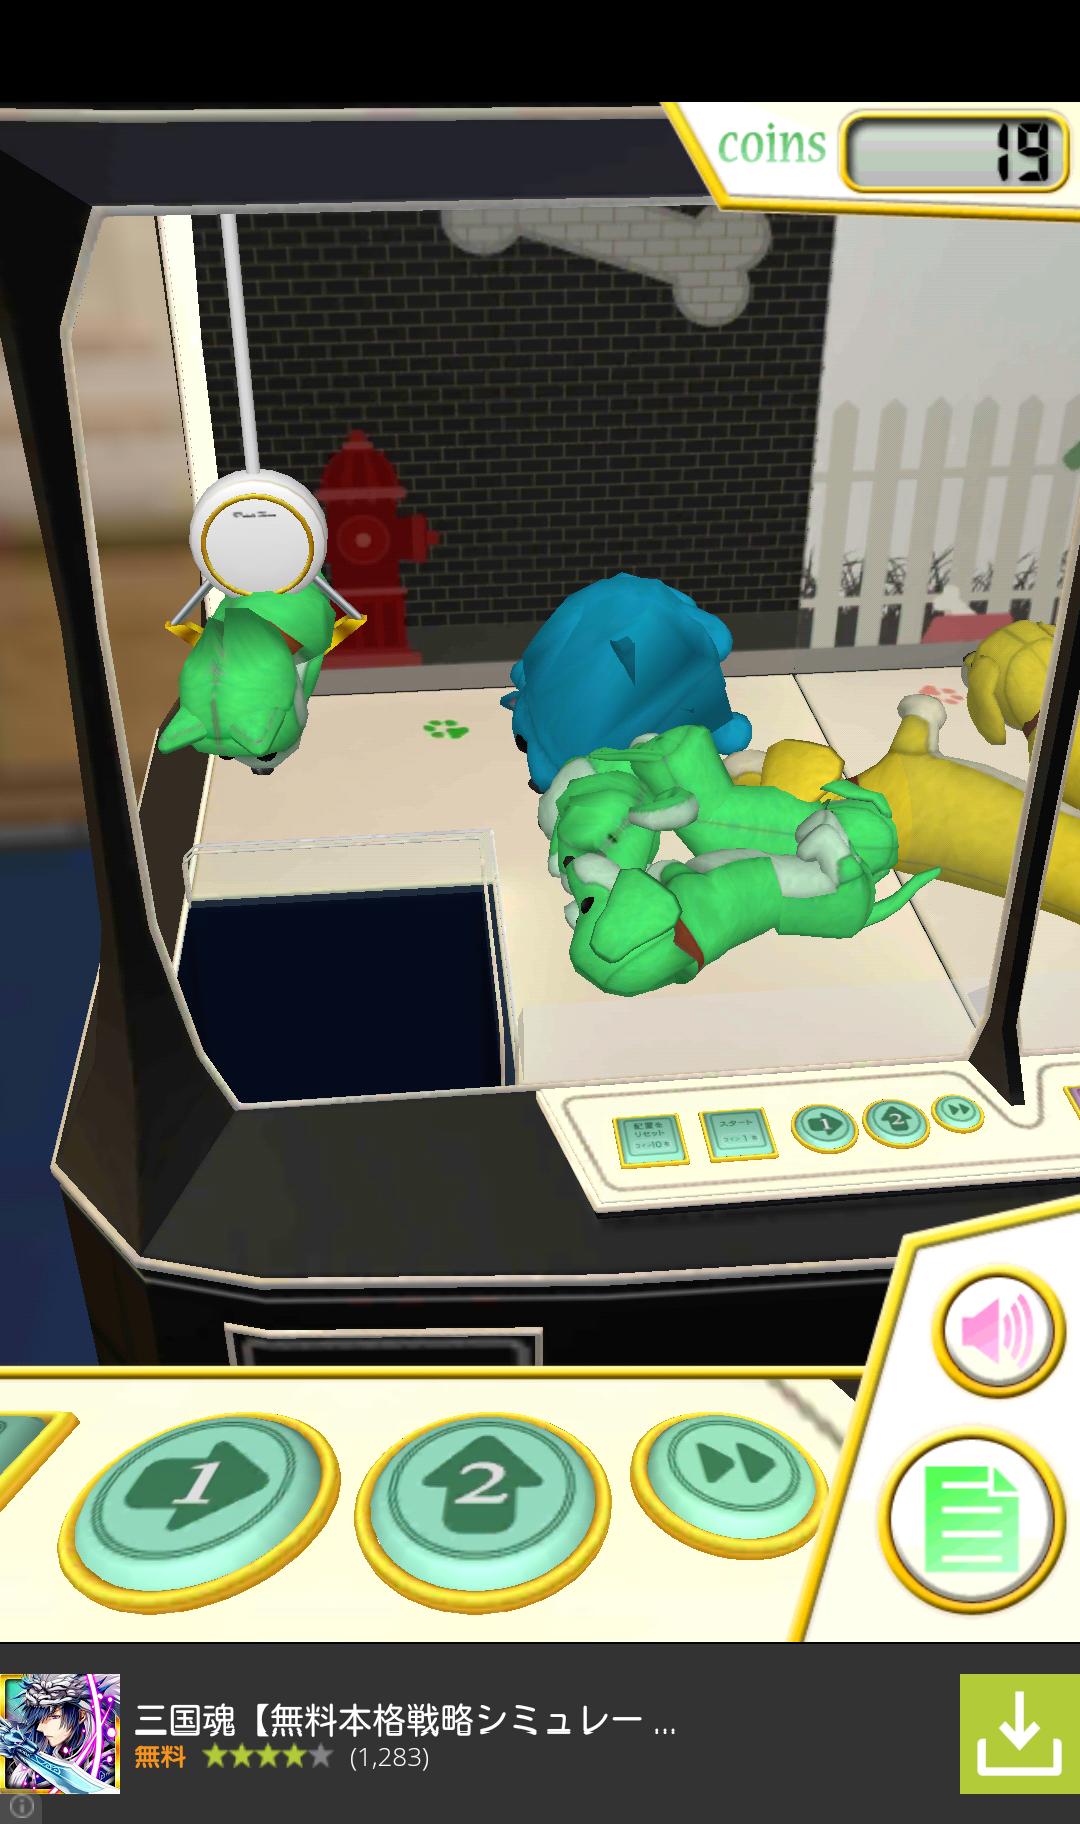 androidアプリ へなへな子犬キャッチャー攻略スクリーンショット4